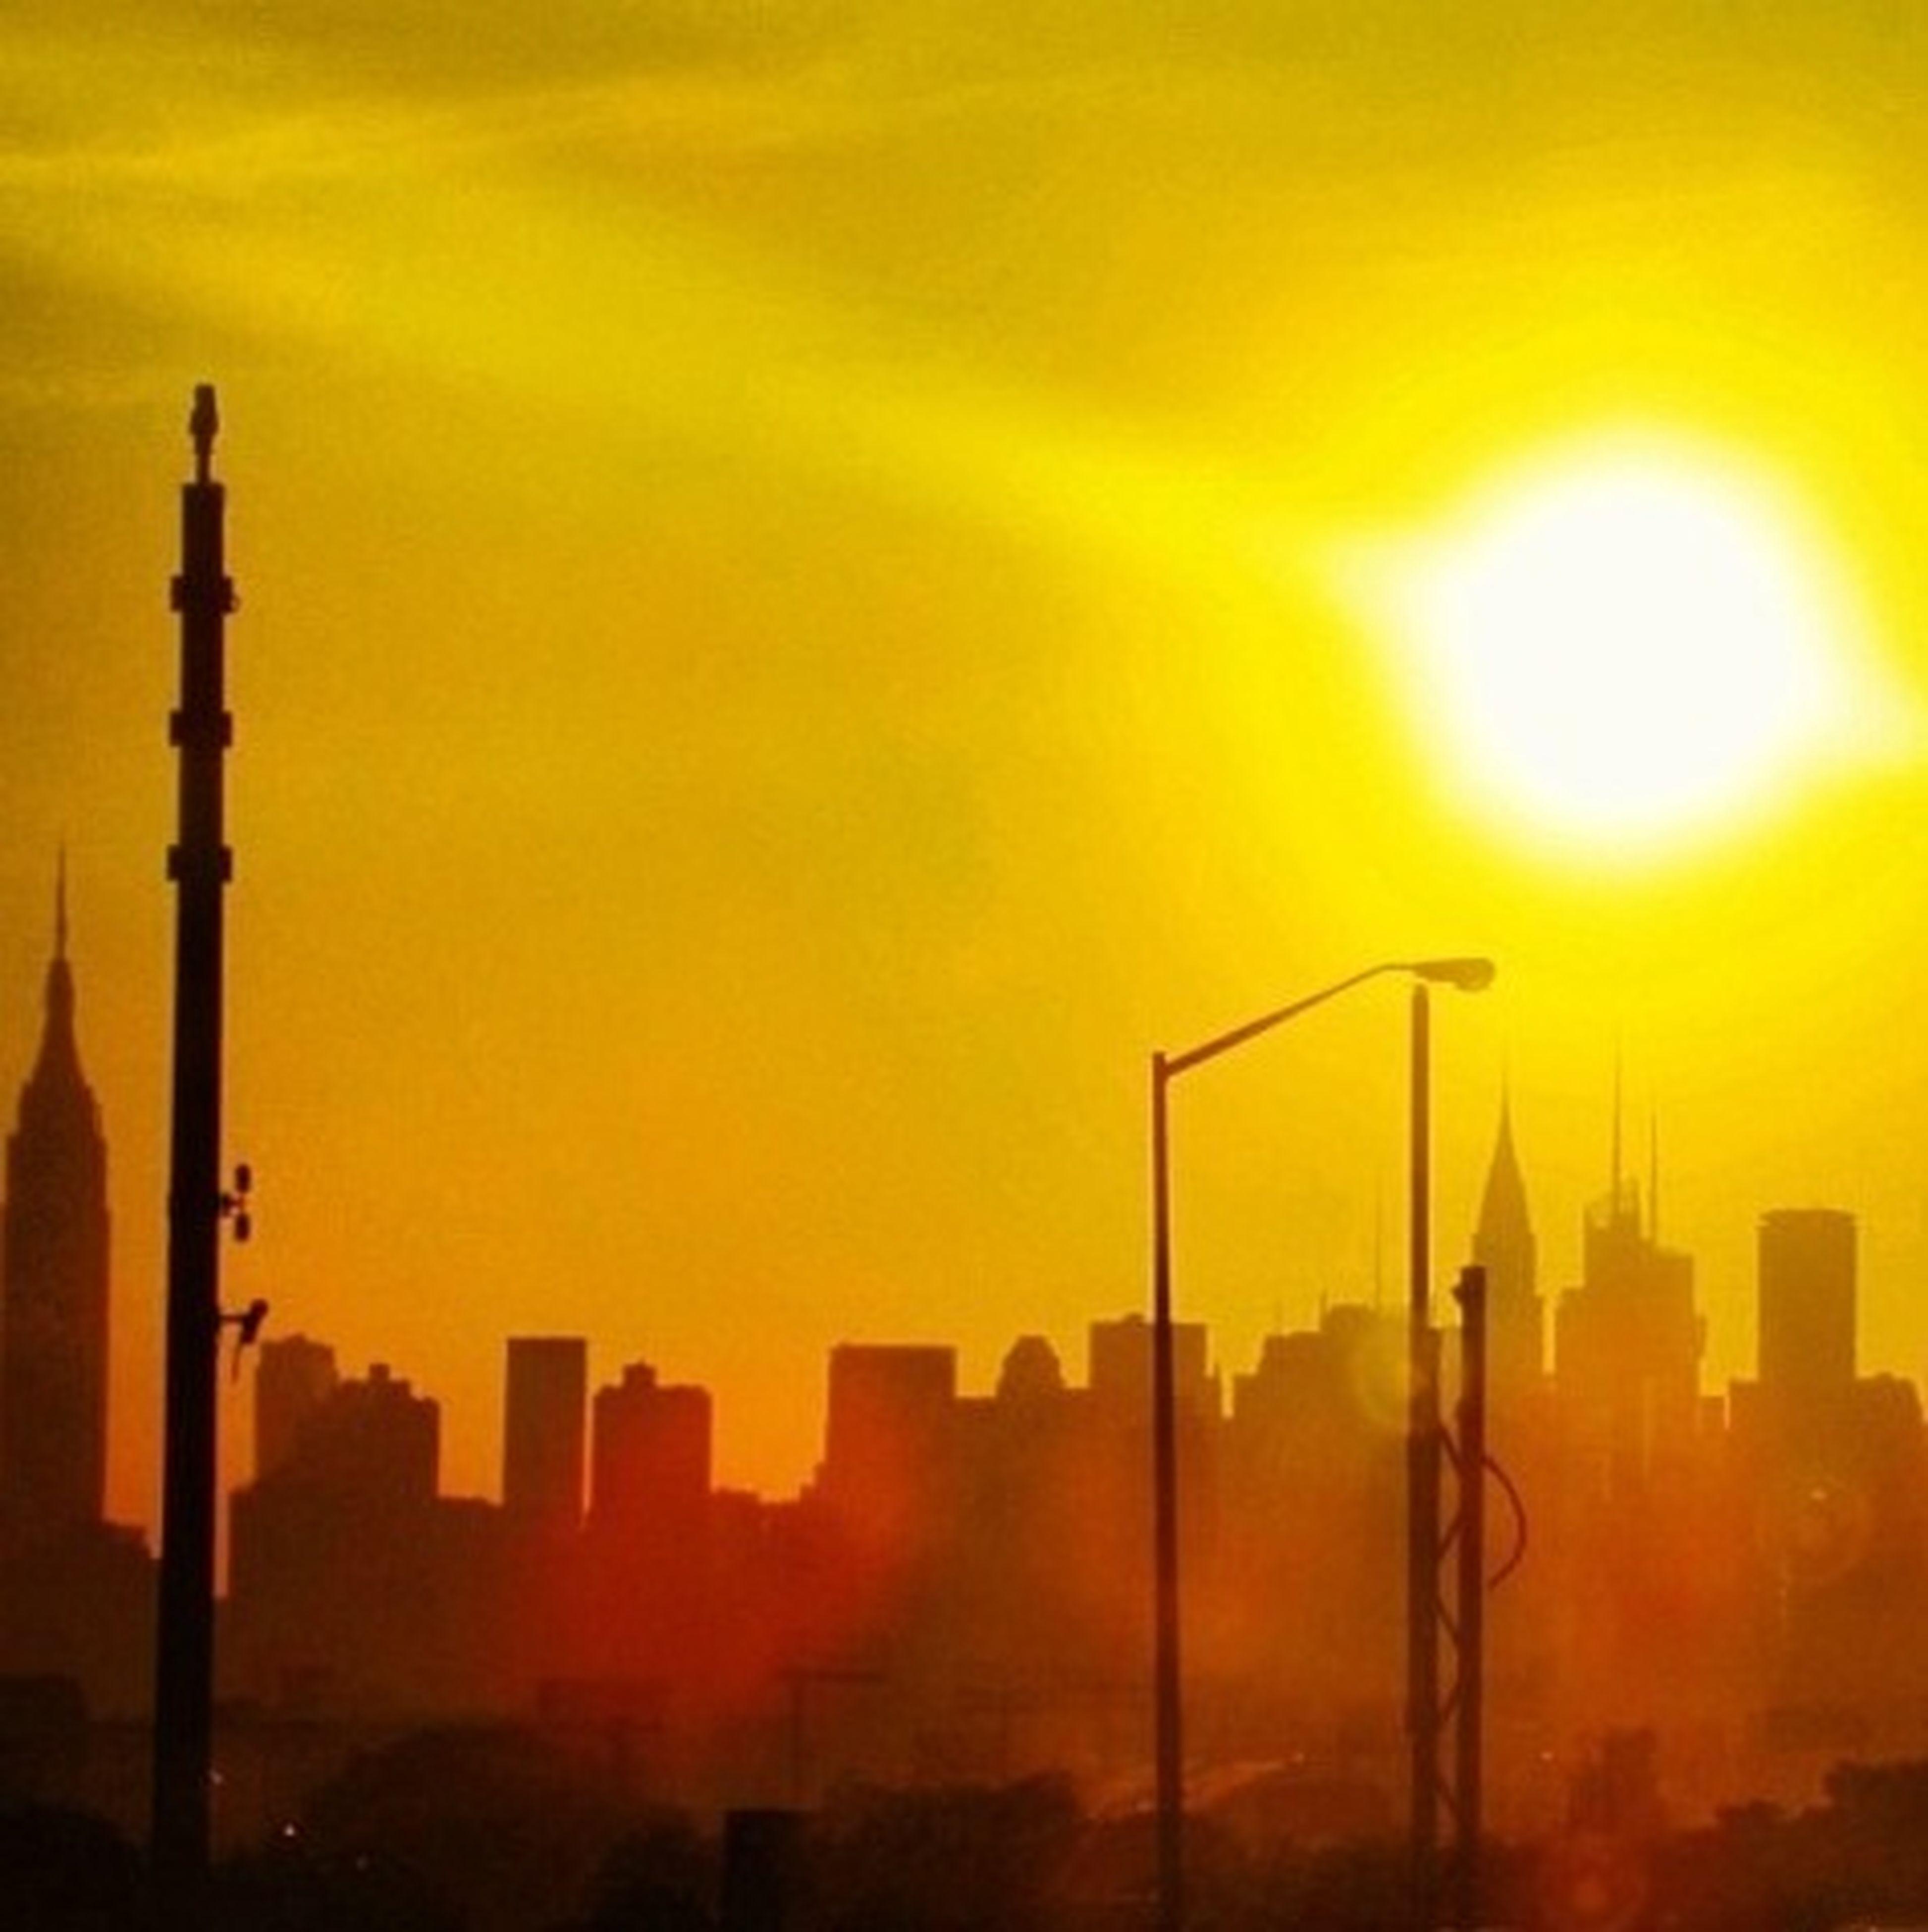 sunset, building exterior, architecture, built structure, city, orange color, tower, skyscraper, cityscape, tall - high, silhouette, sun, sky, communications tower, urban skyline, capital cities, street light, building, sunlight, city life